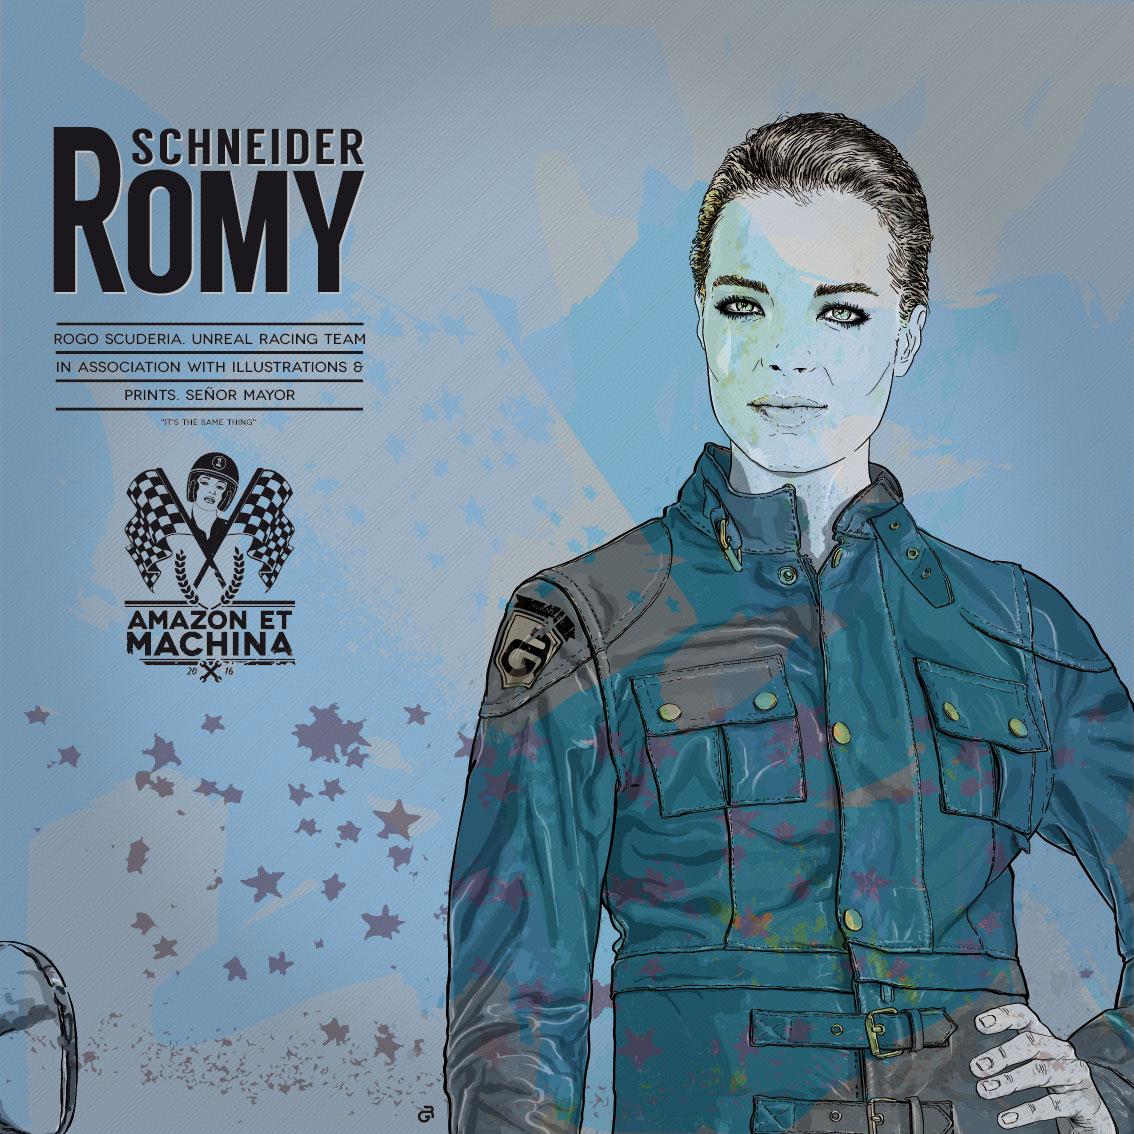 Romy y su BMW. Retrato Amazon et machina